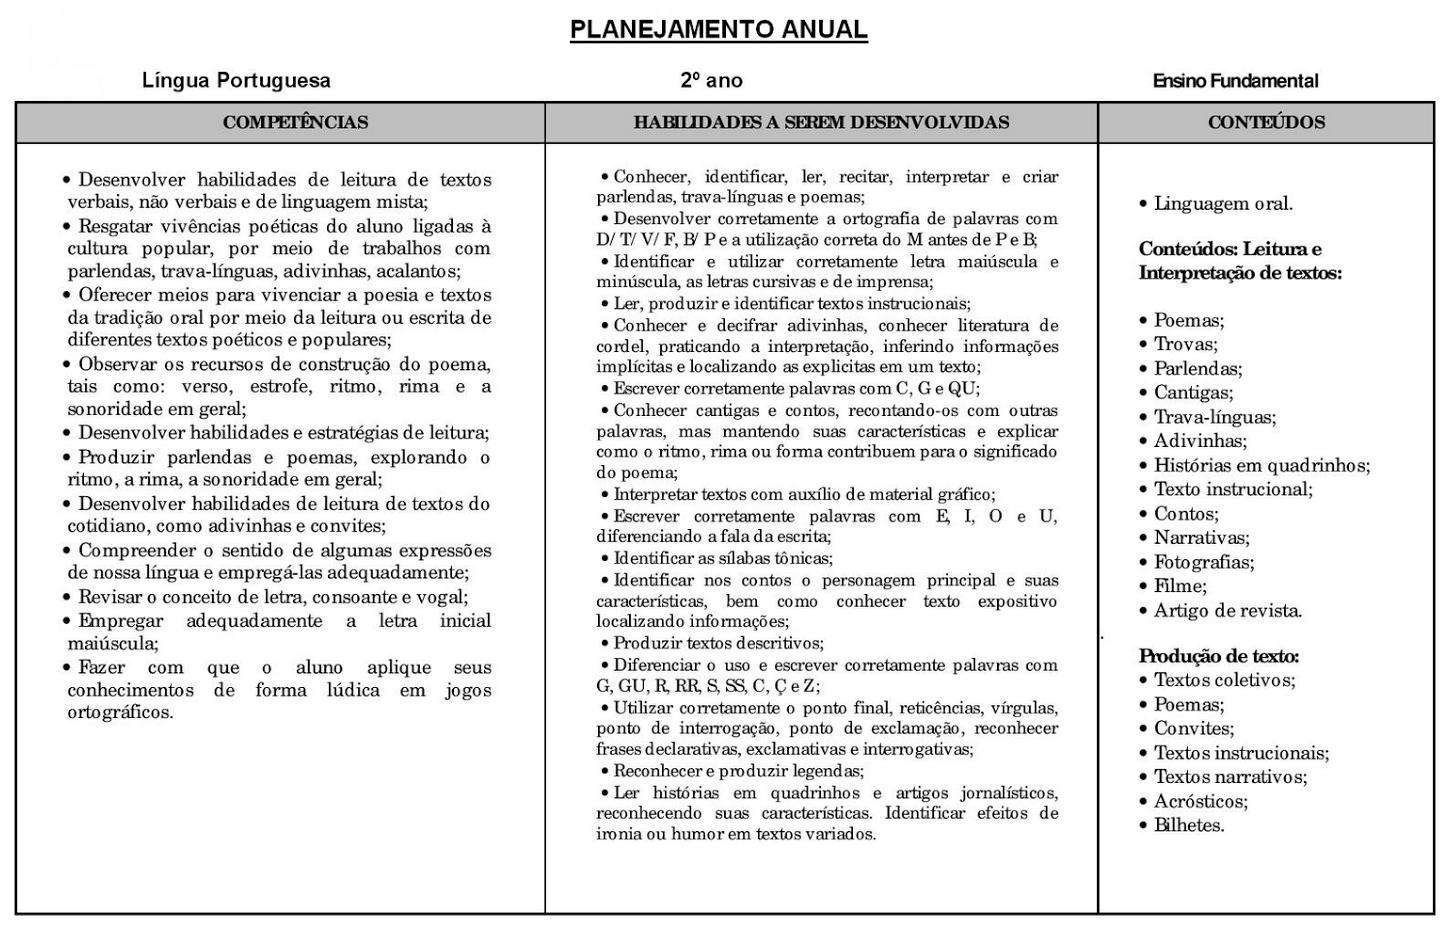 Planejamento anual 2 ano de Língua Portuguesa para imprimir